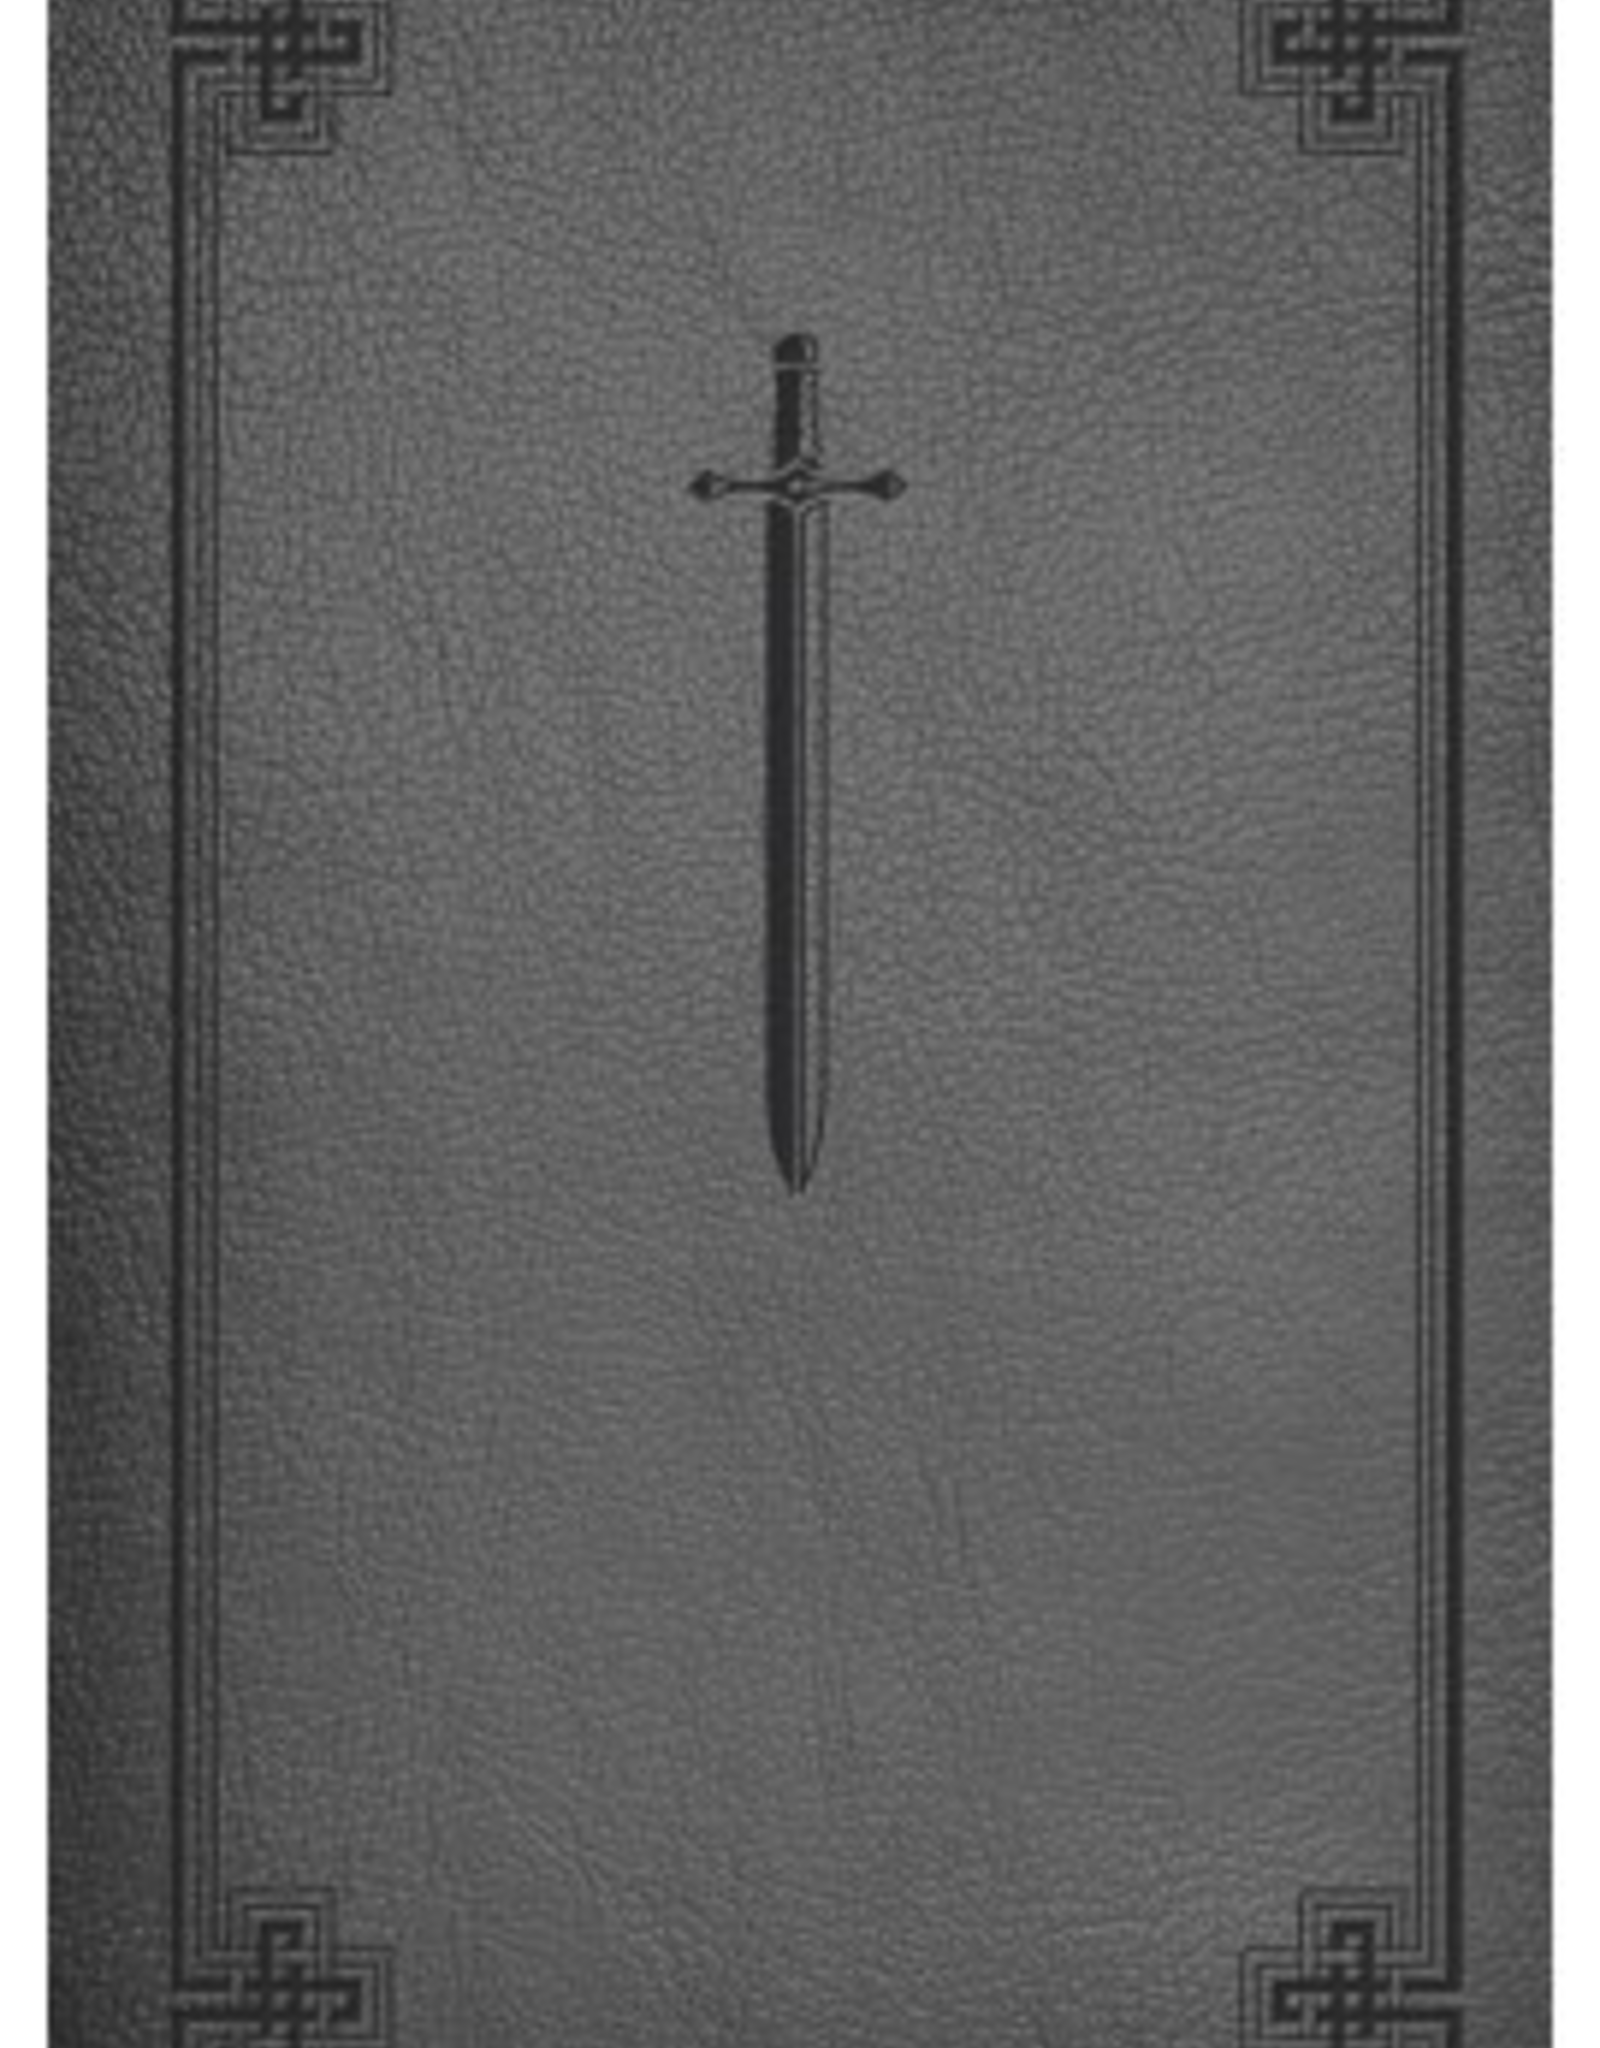 Tan Books Manual for Spiritual Warfare, by Paul Thigpen (leather)